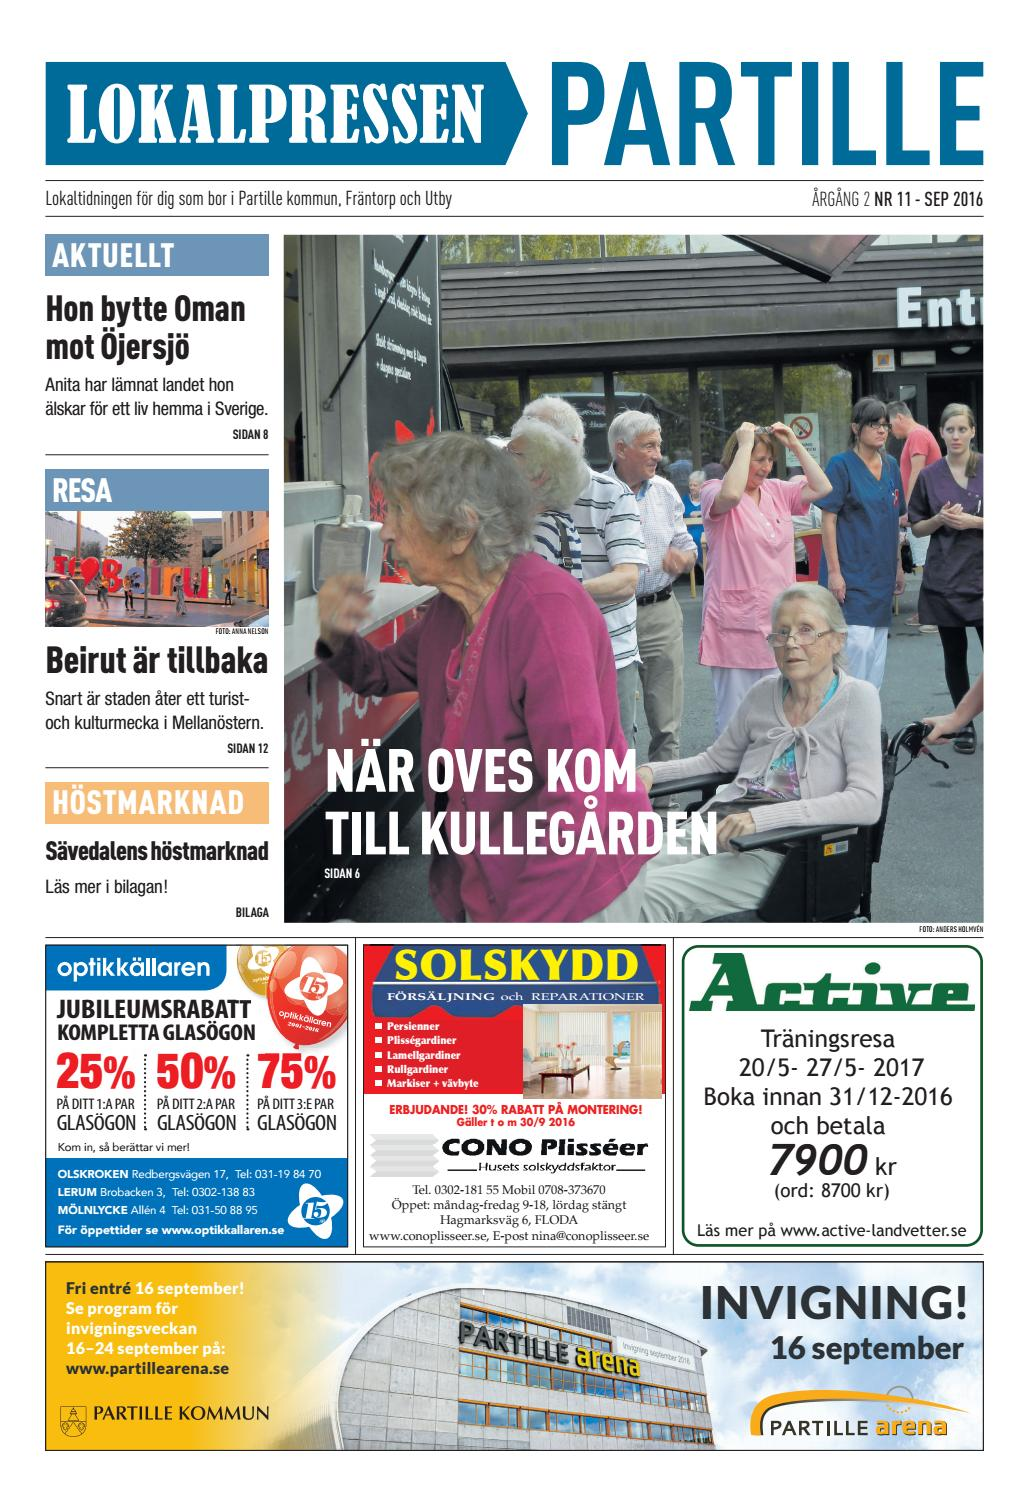 Maria sprider norrlndskt lugn p stationen i jersj - Partillebo